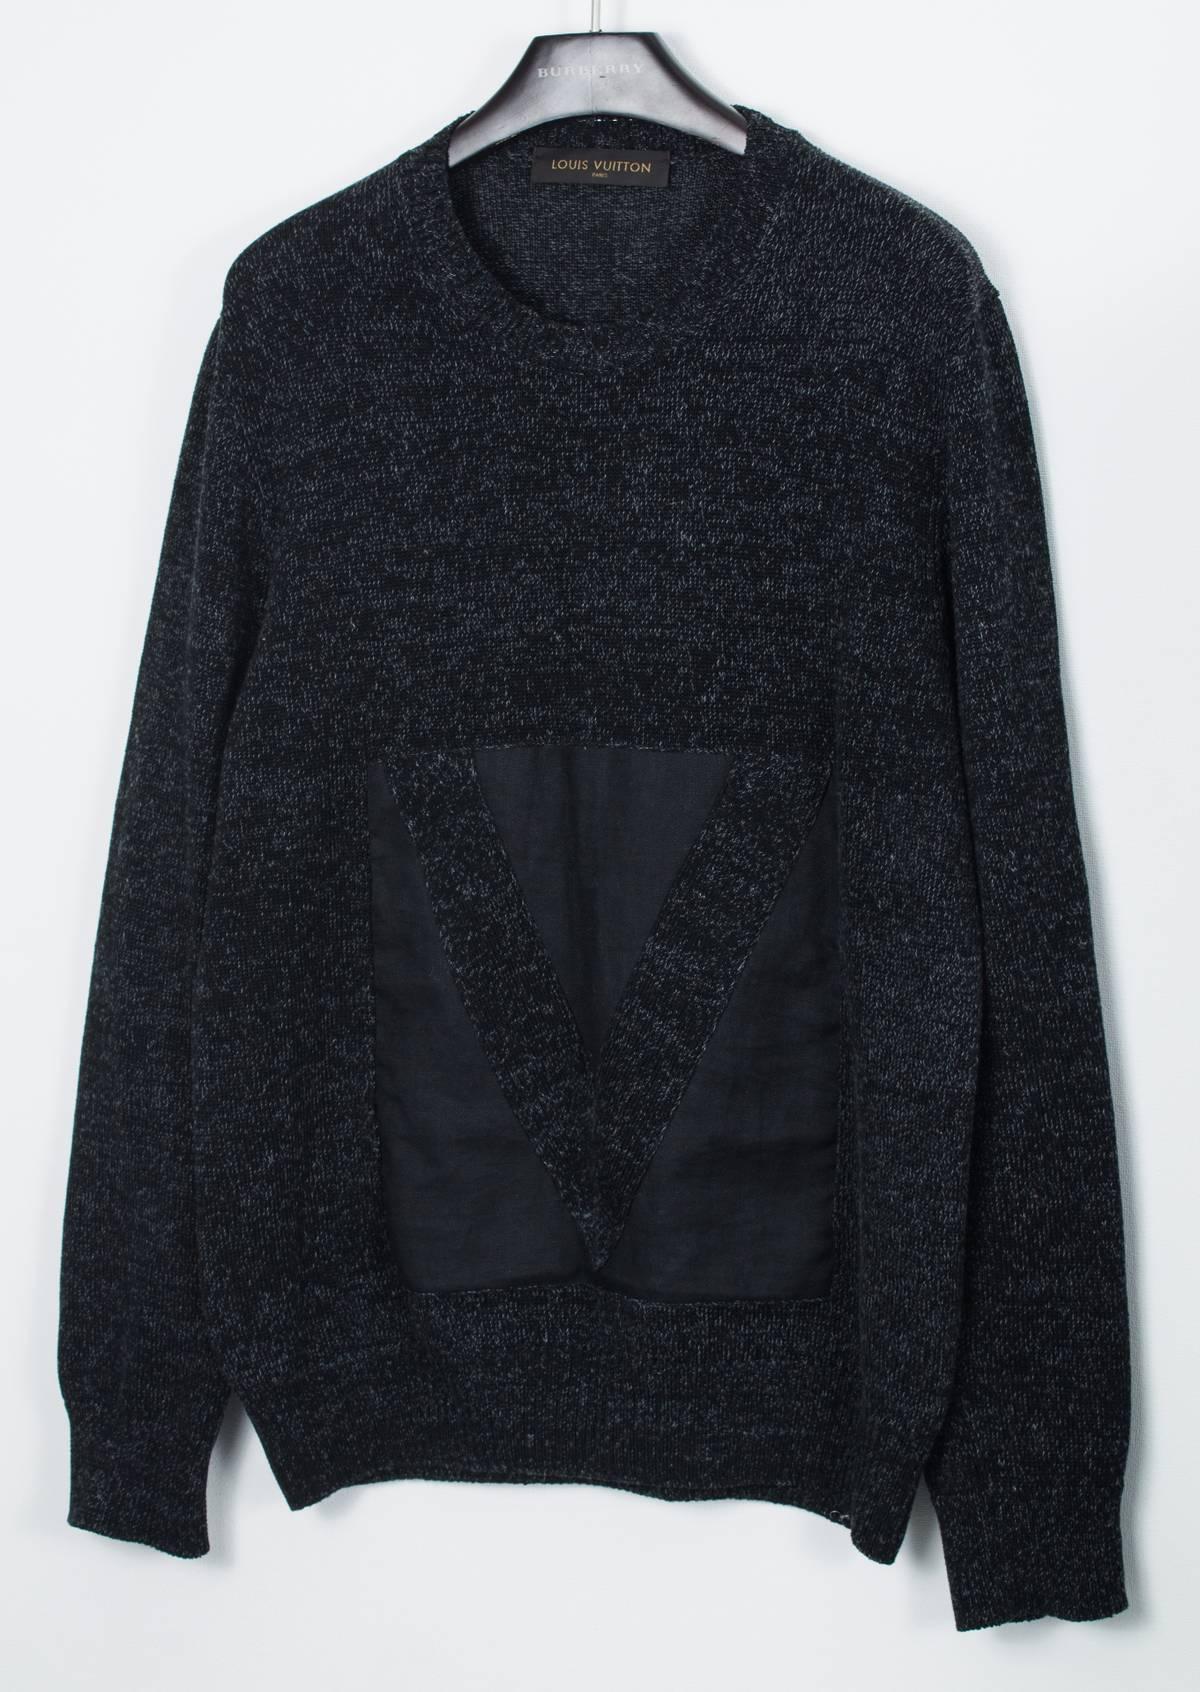 Louis Vuitton Luxury Mens Louis Vuitton Knit Logo V Sweater Jumper